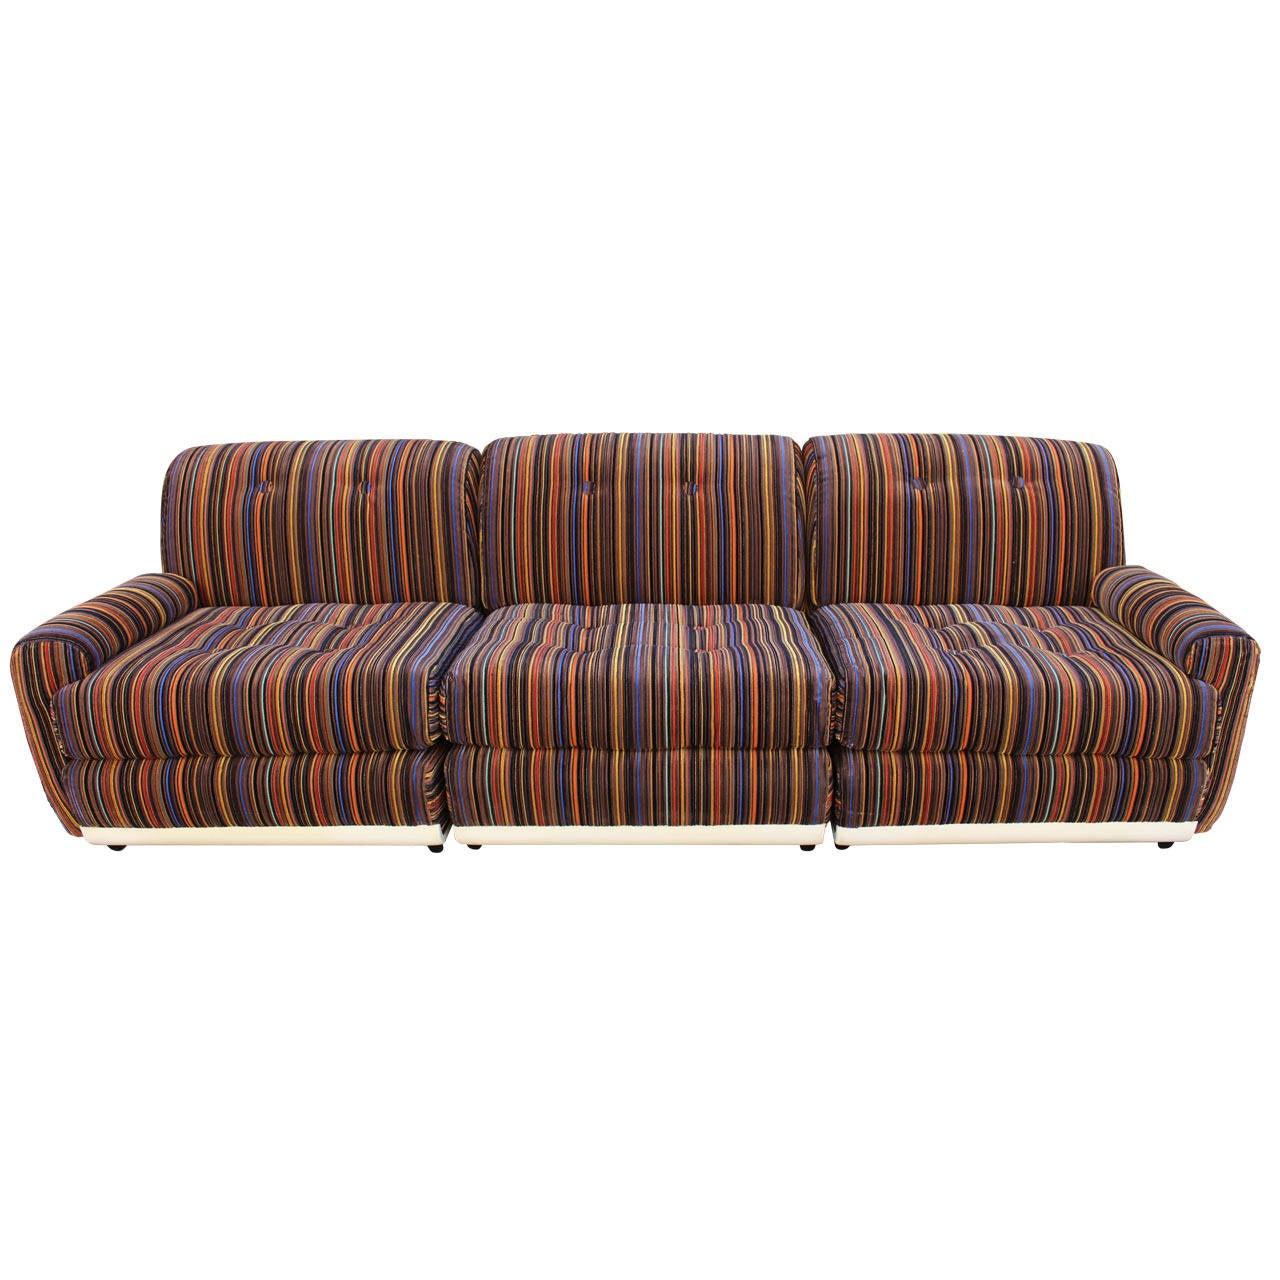 Italian Three-Seat Sofa in the Style of Mario Bellini For Sale